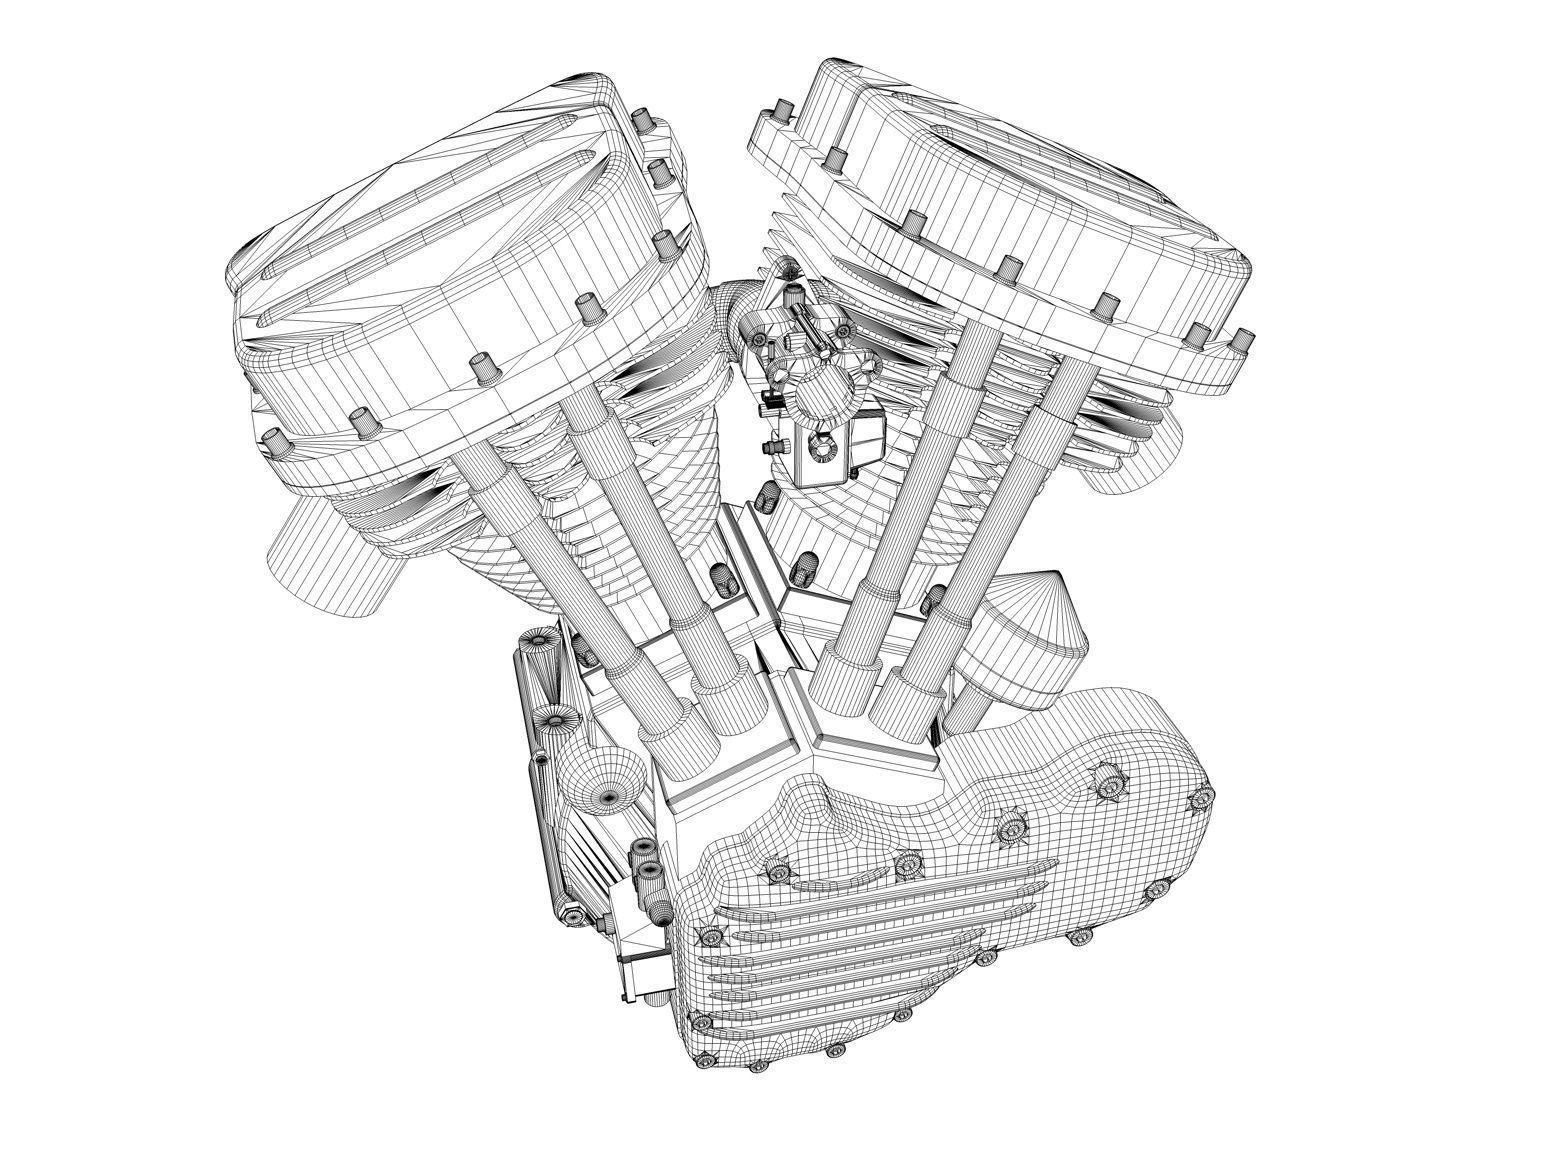 Believer magazine schema progress jackienoname seymour duncan strat harley davidson wiring harness diagram